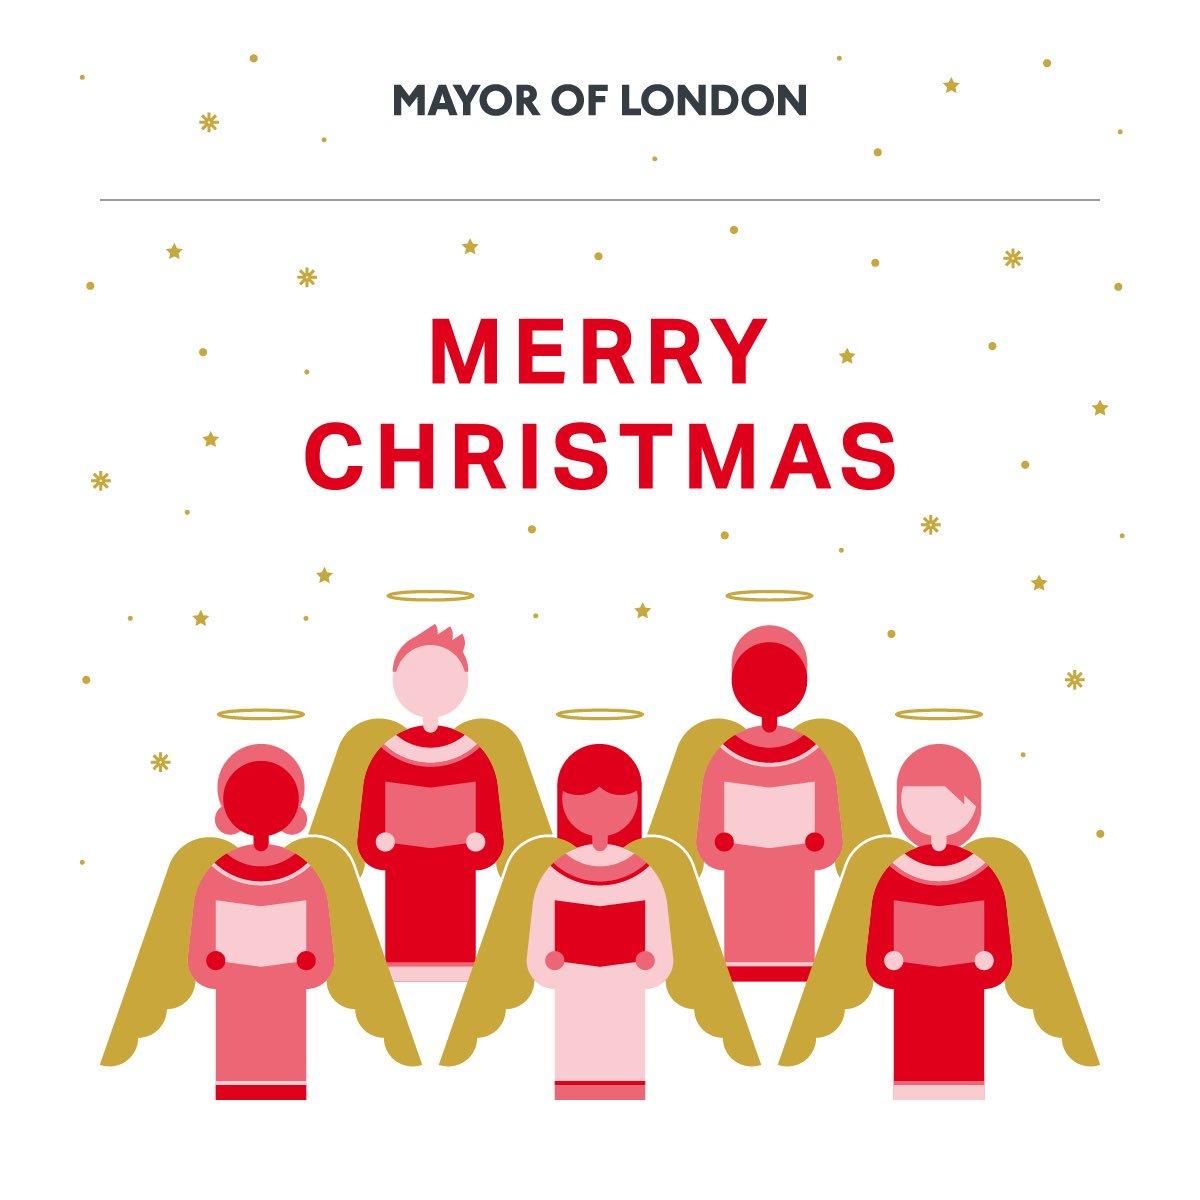 Merry Christmas London! #MerryChristmas https://t.co/CoAlc1vnb6